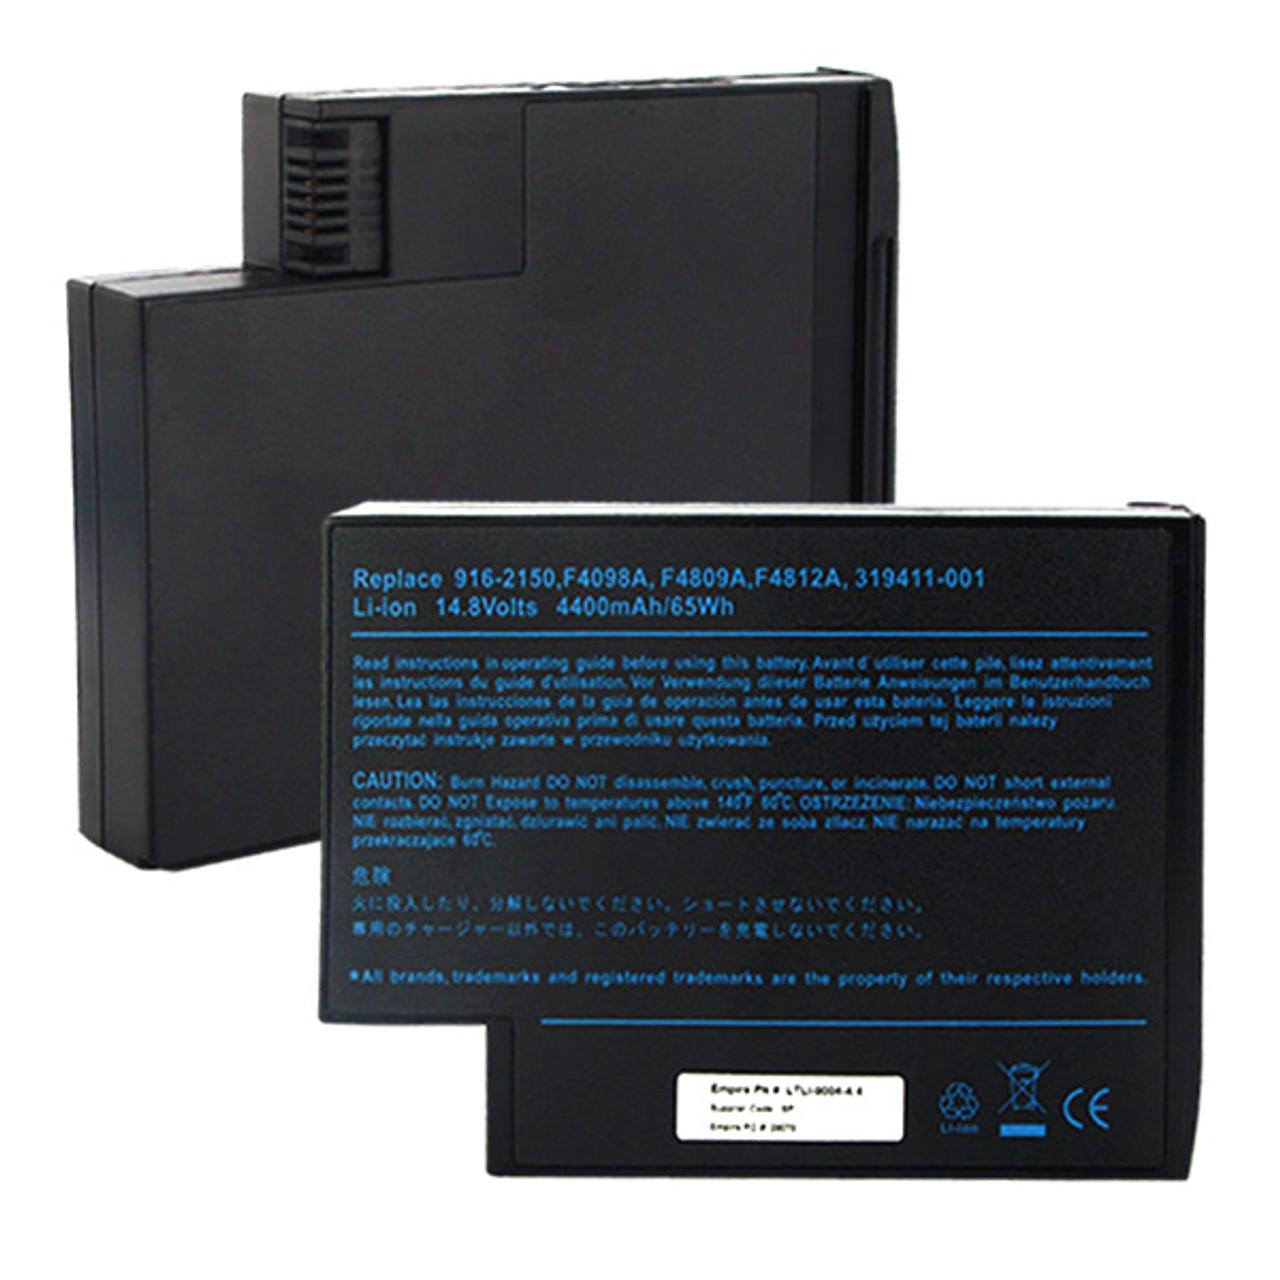 cb8e9584bb3e HP Compaq DB946A Laptop Battery Replacement 4400mAh